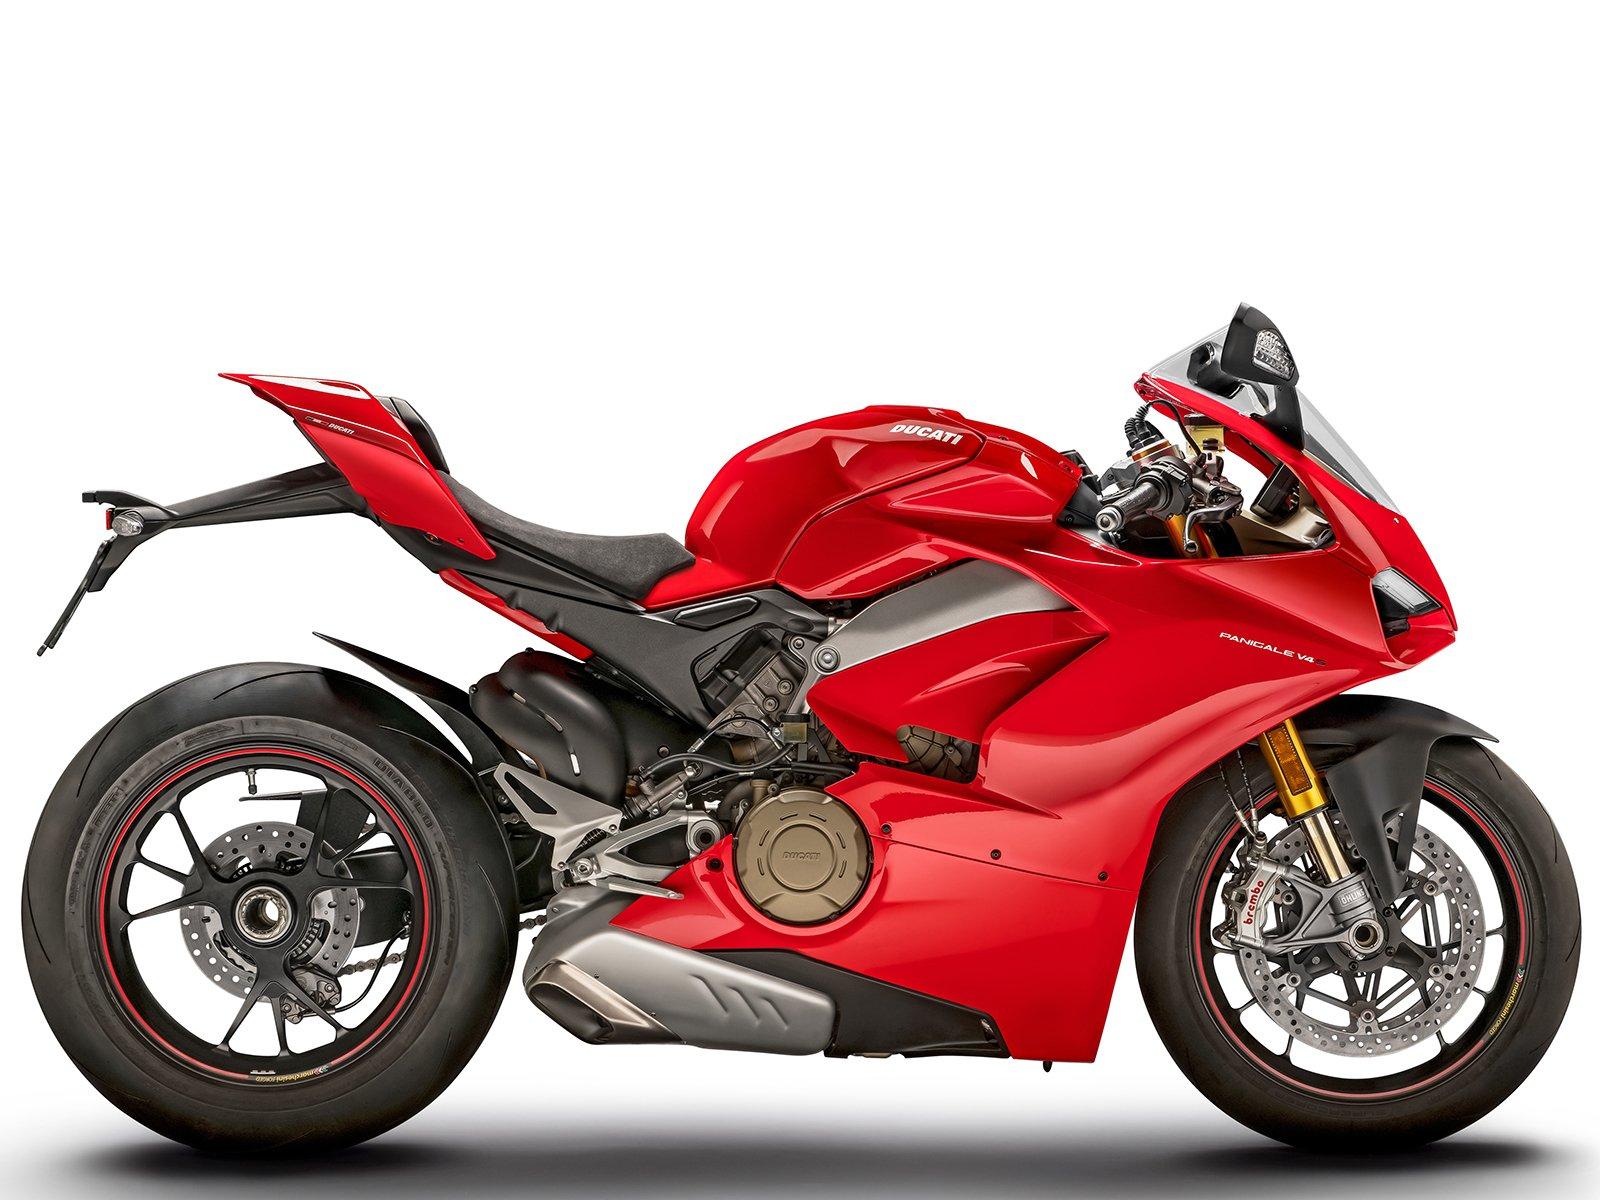 Мотоцикл DUCATI Panigale V4 S - Ducati Red (2019)